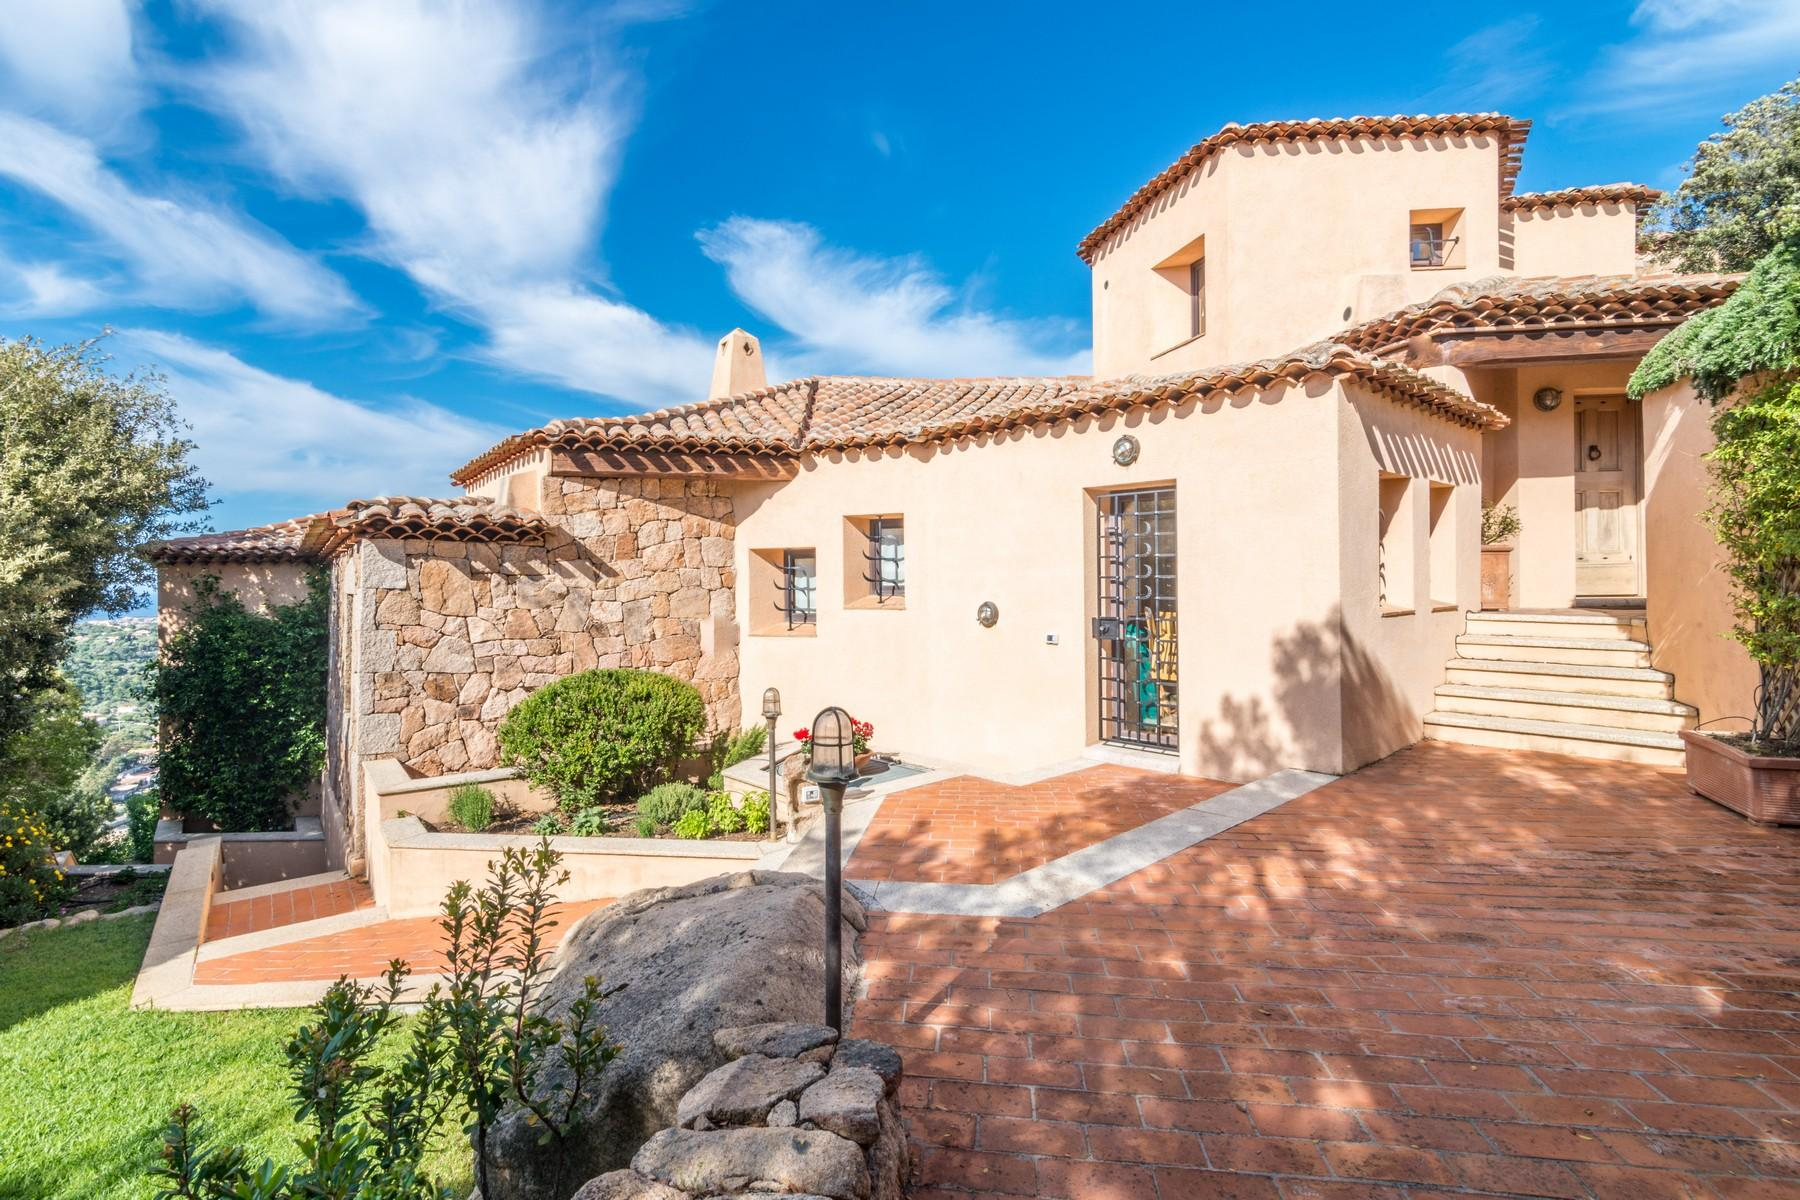 Porto Cervo Abbiadori Splendide villa jumelée avec vue sur le golfe de Pevero - 29